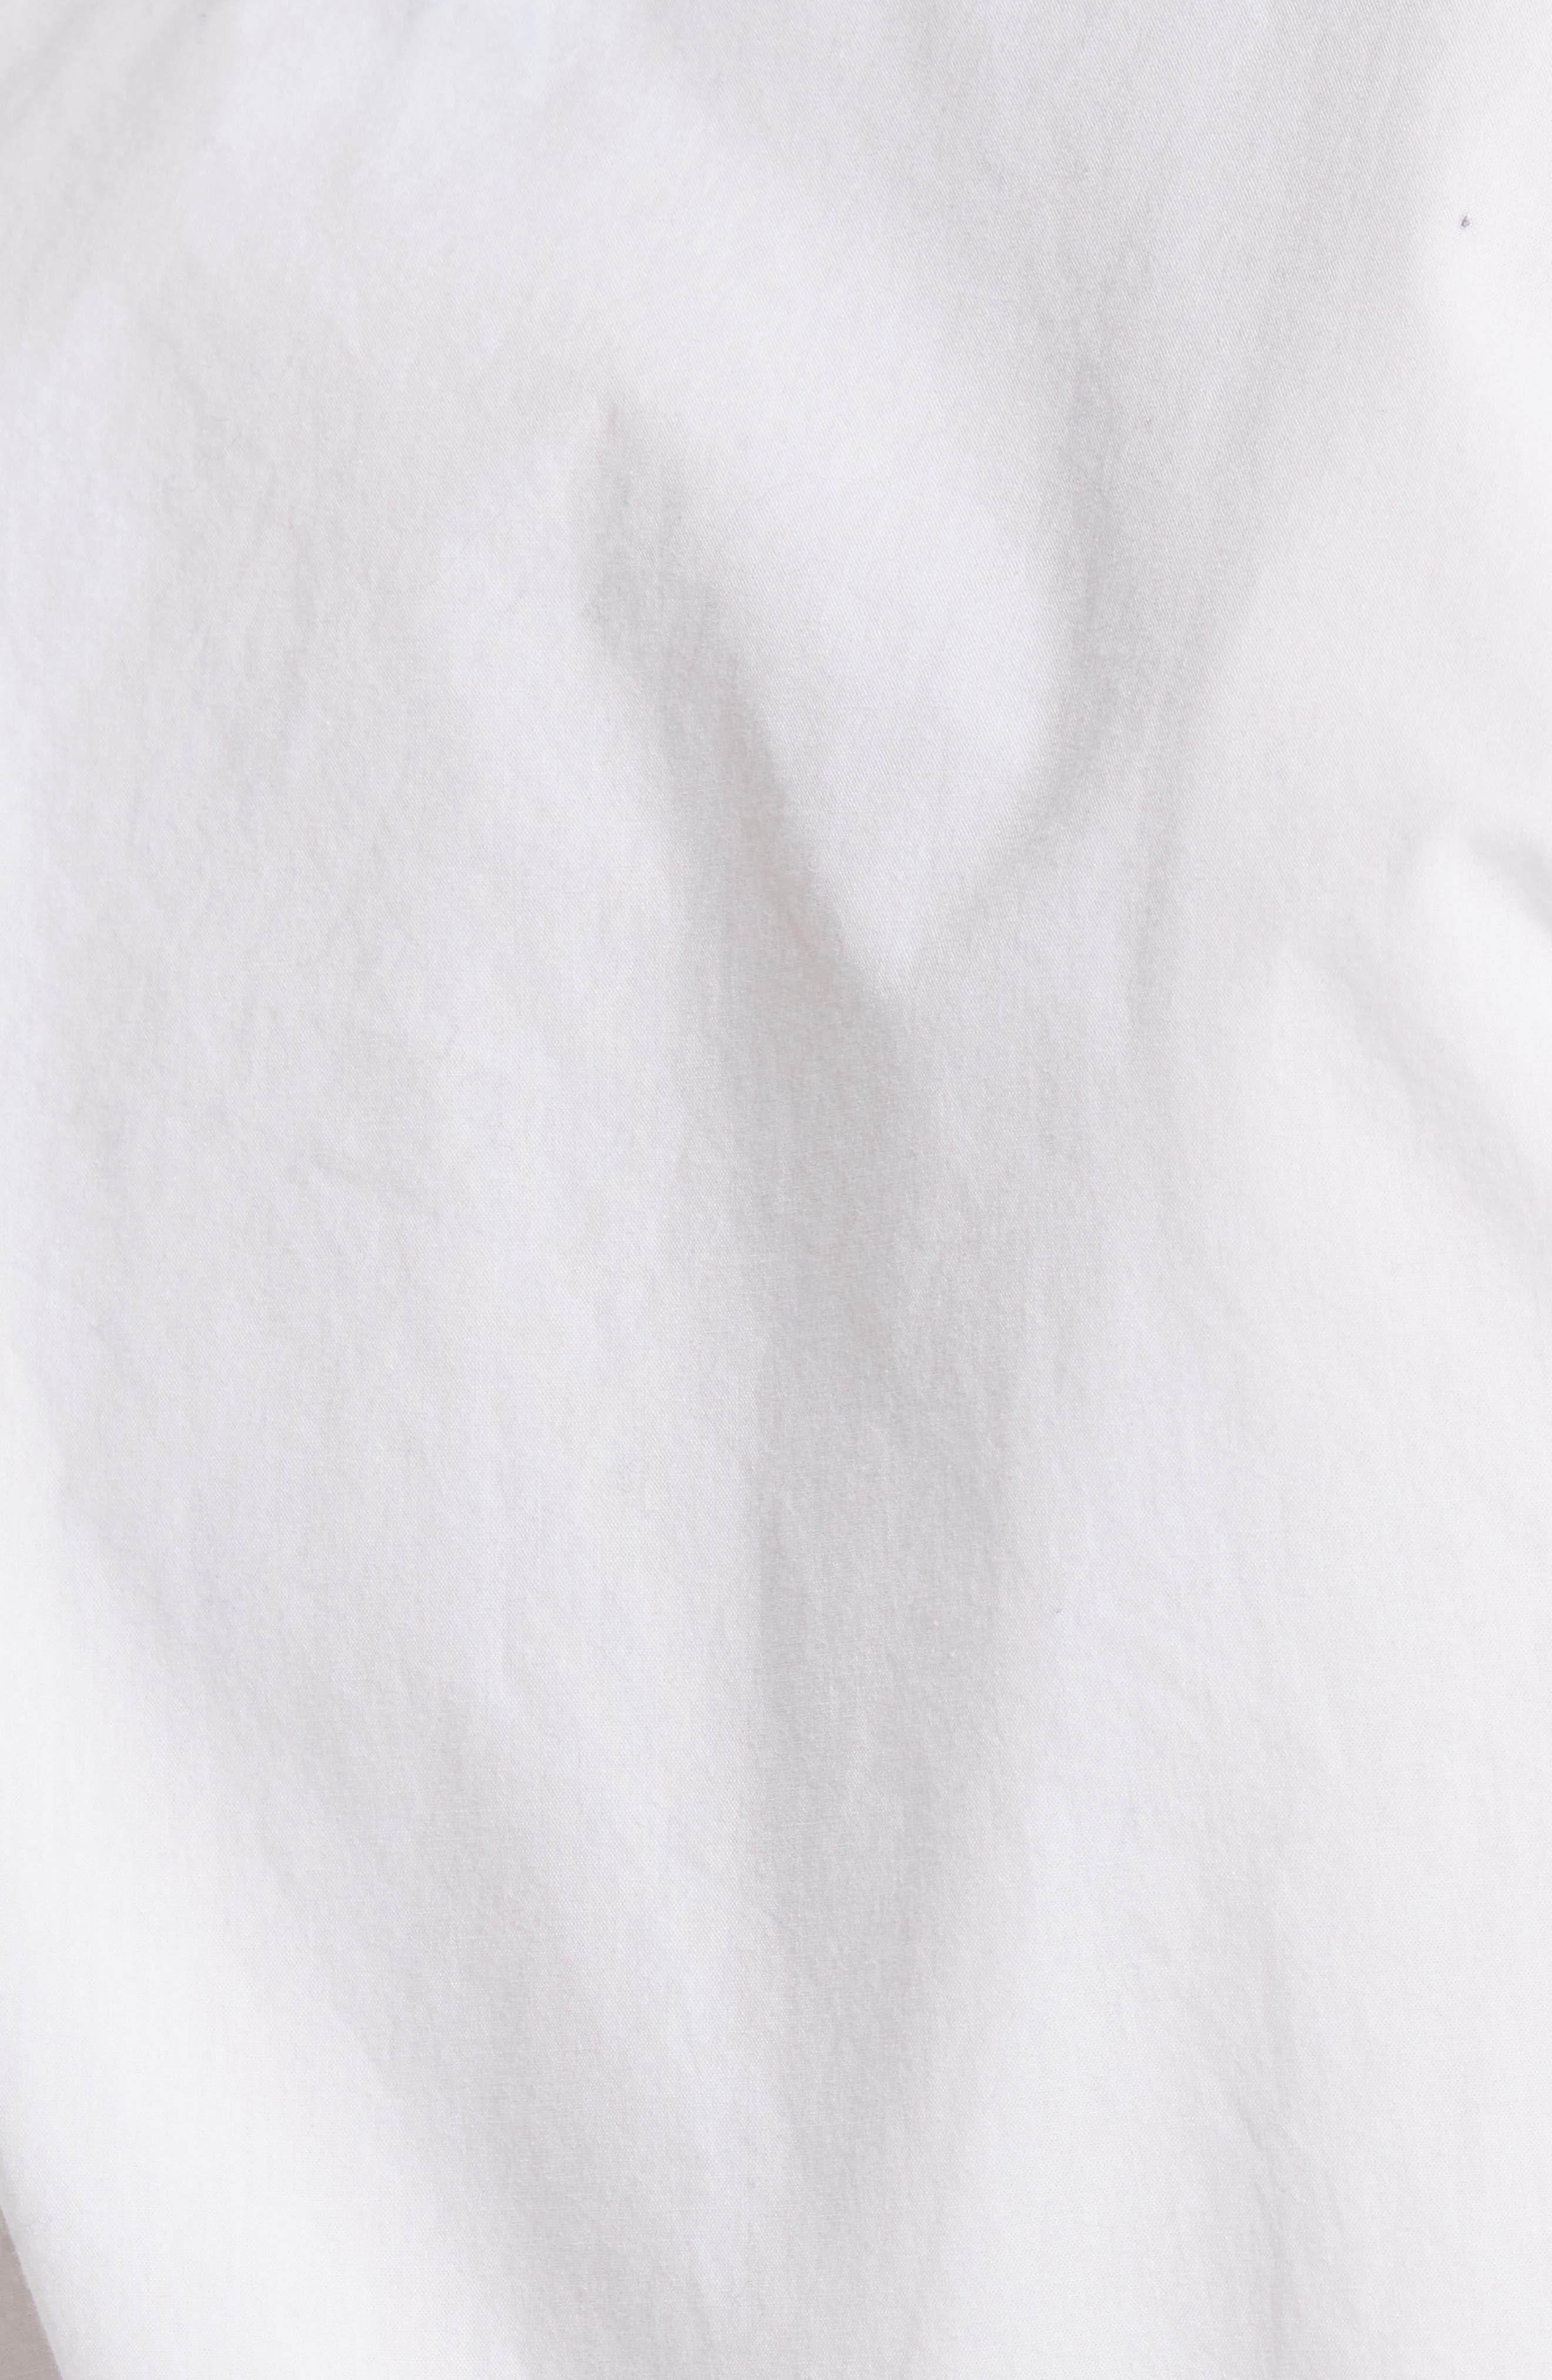 Hausu Bow Back Blouse,                             Alternate thumbnail 5, color,                             Clean White